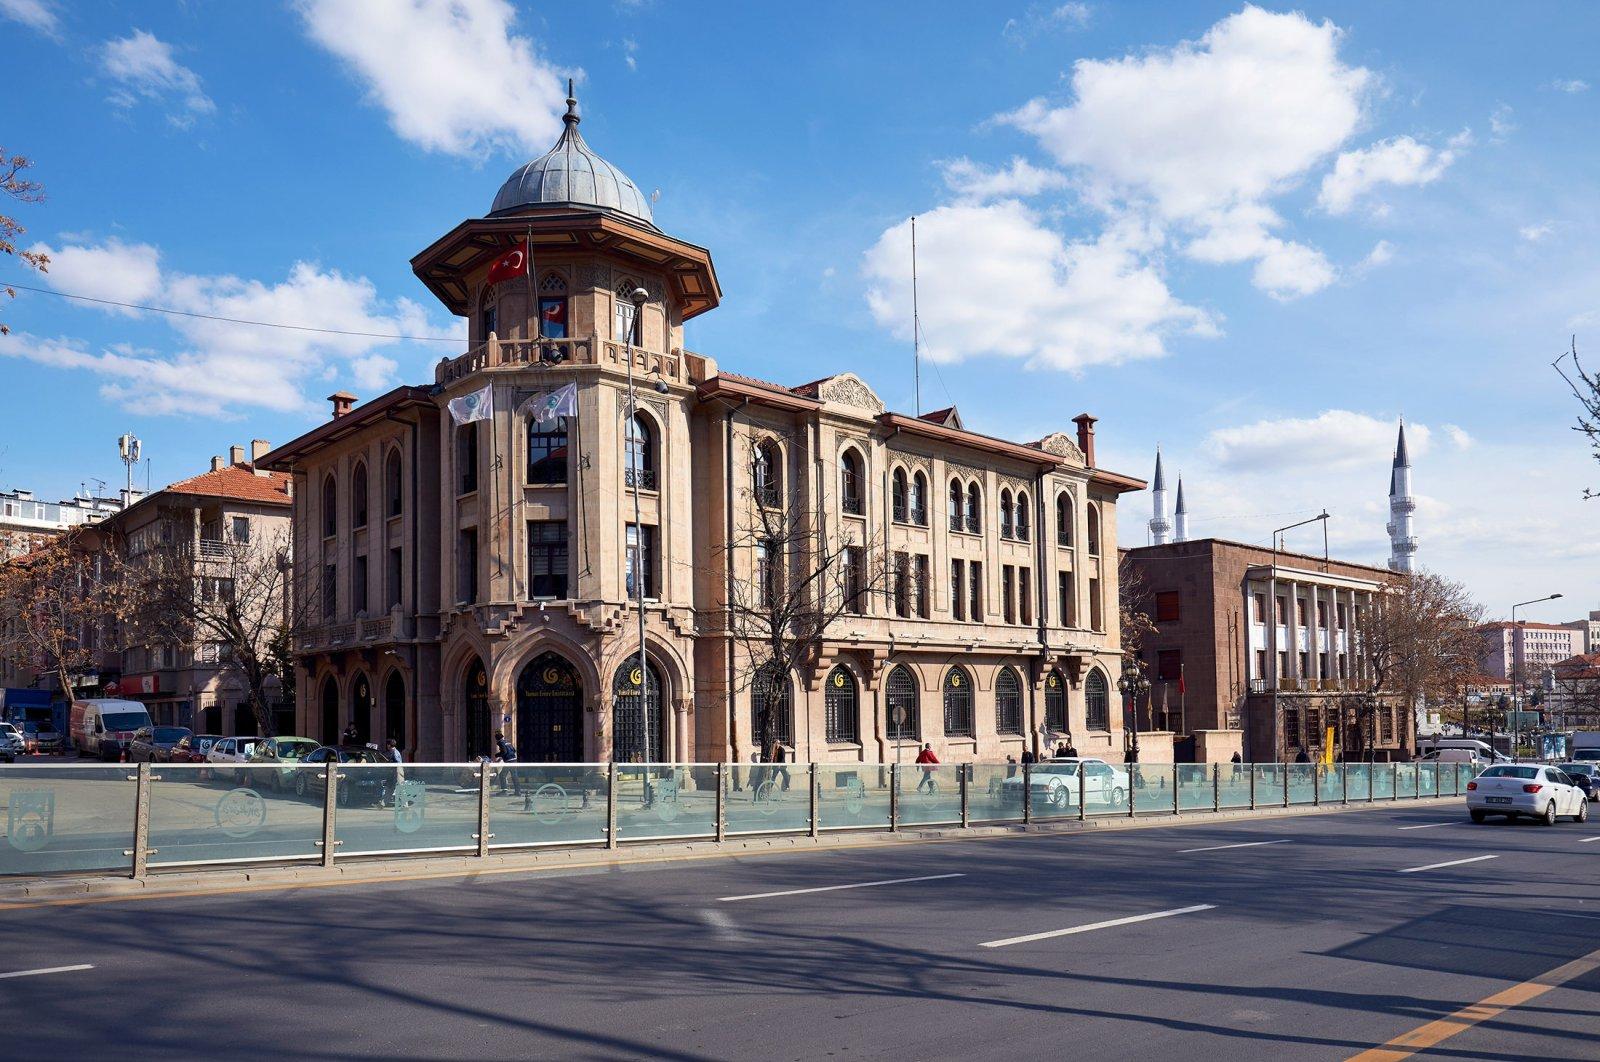 Historical building of Yunus Emre institute of Turkish language and literature education in Ulus, Altindag, Ankara, March, 2020 (İstock Photo)